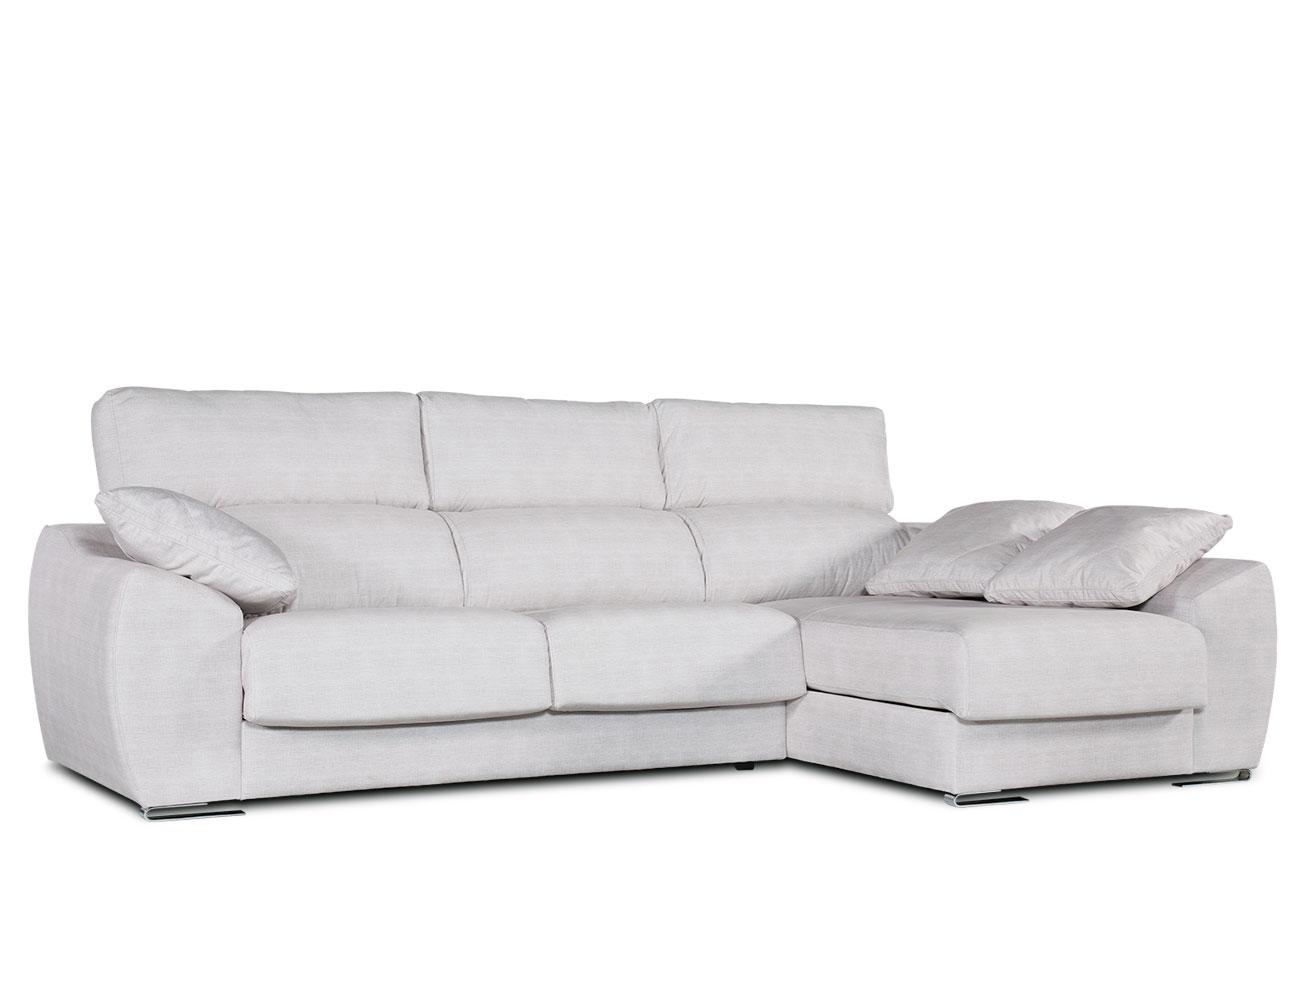 Sofa chaiselongue moderno blanco 11